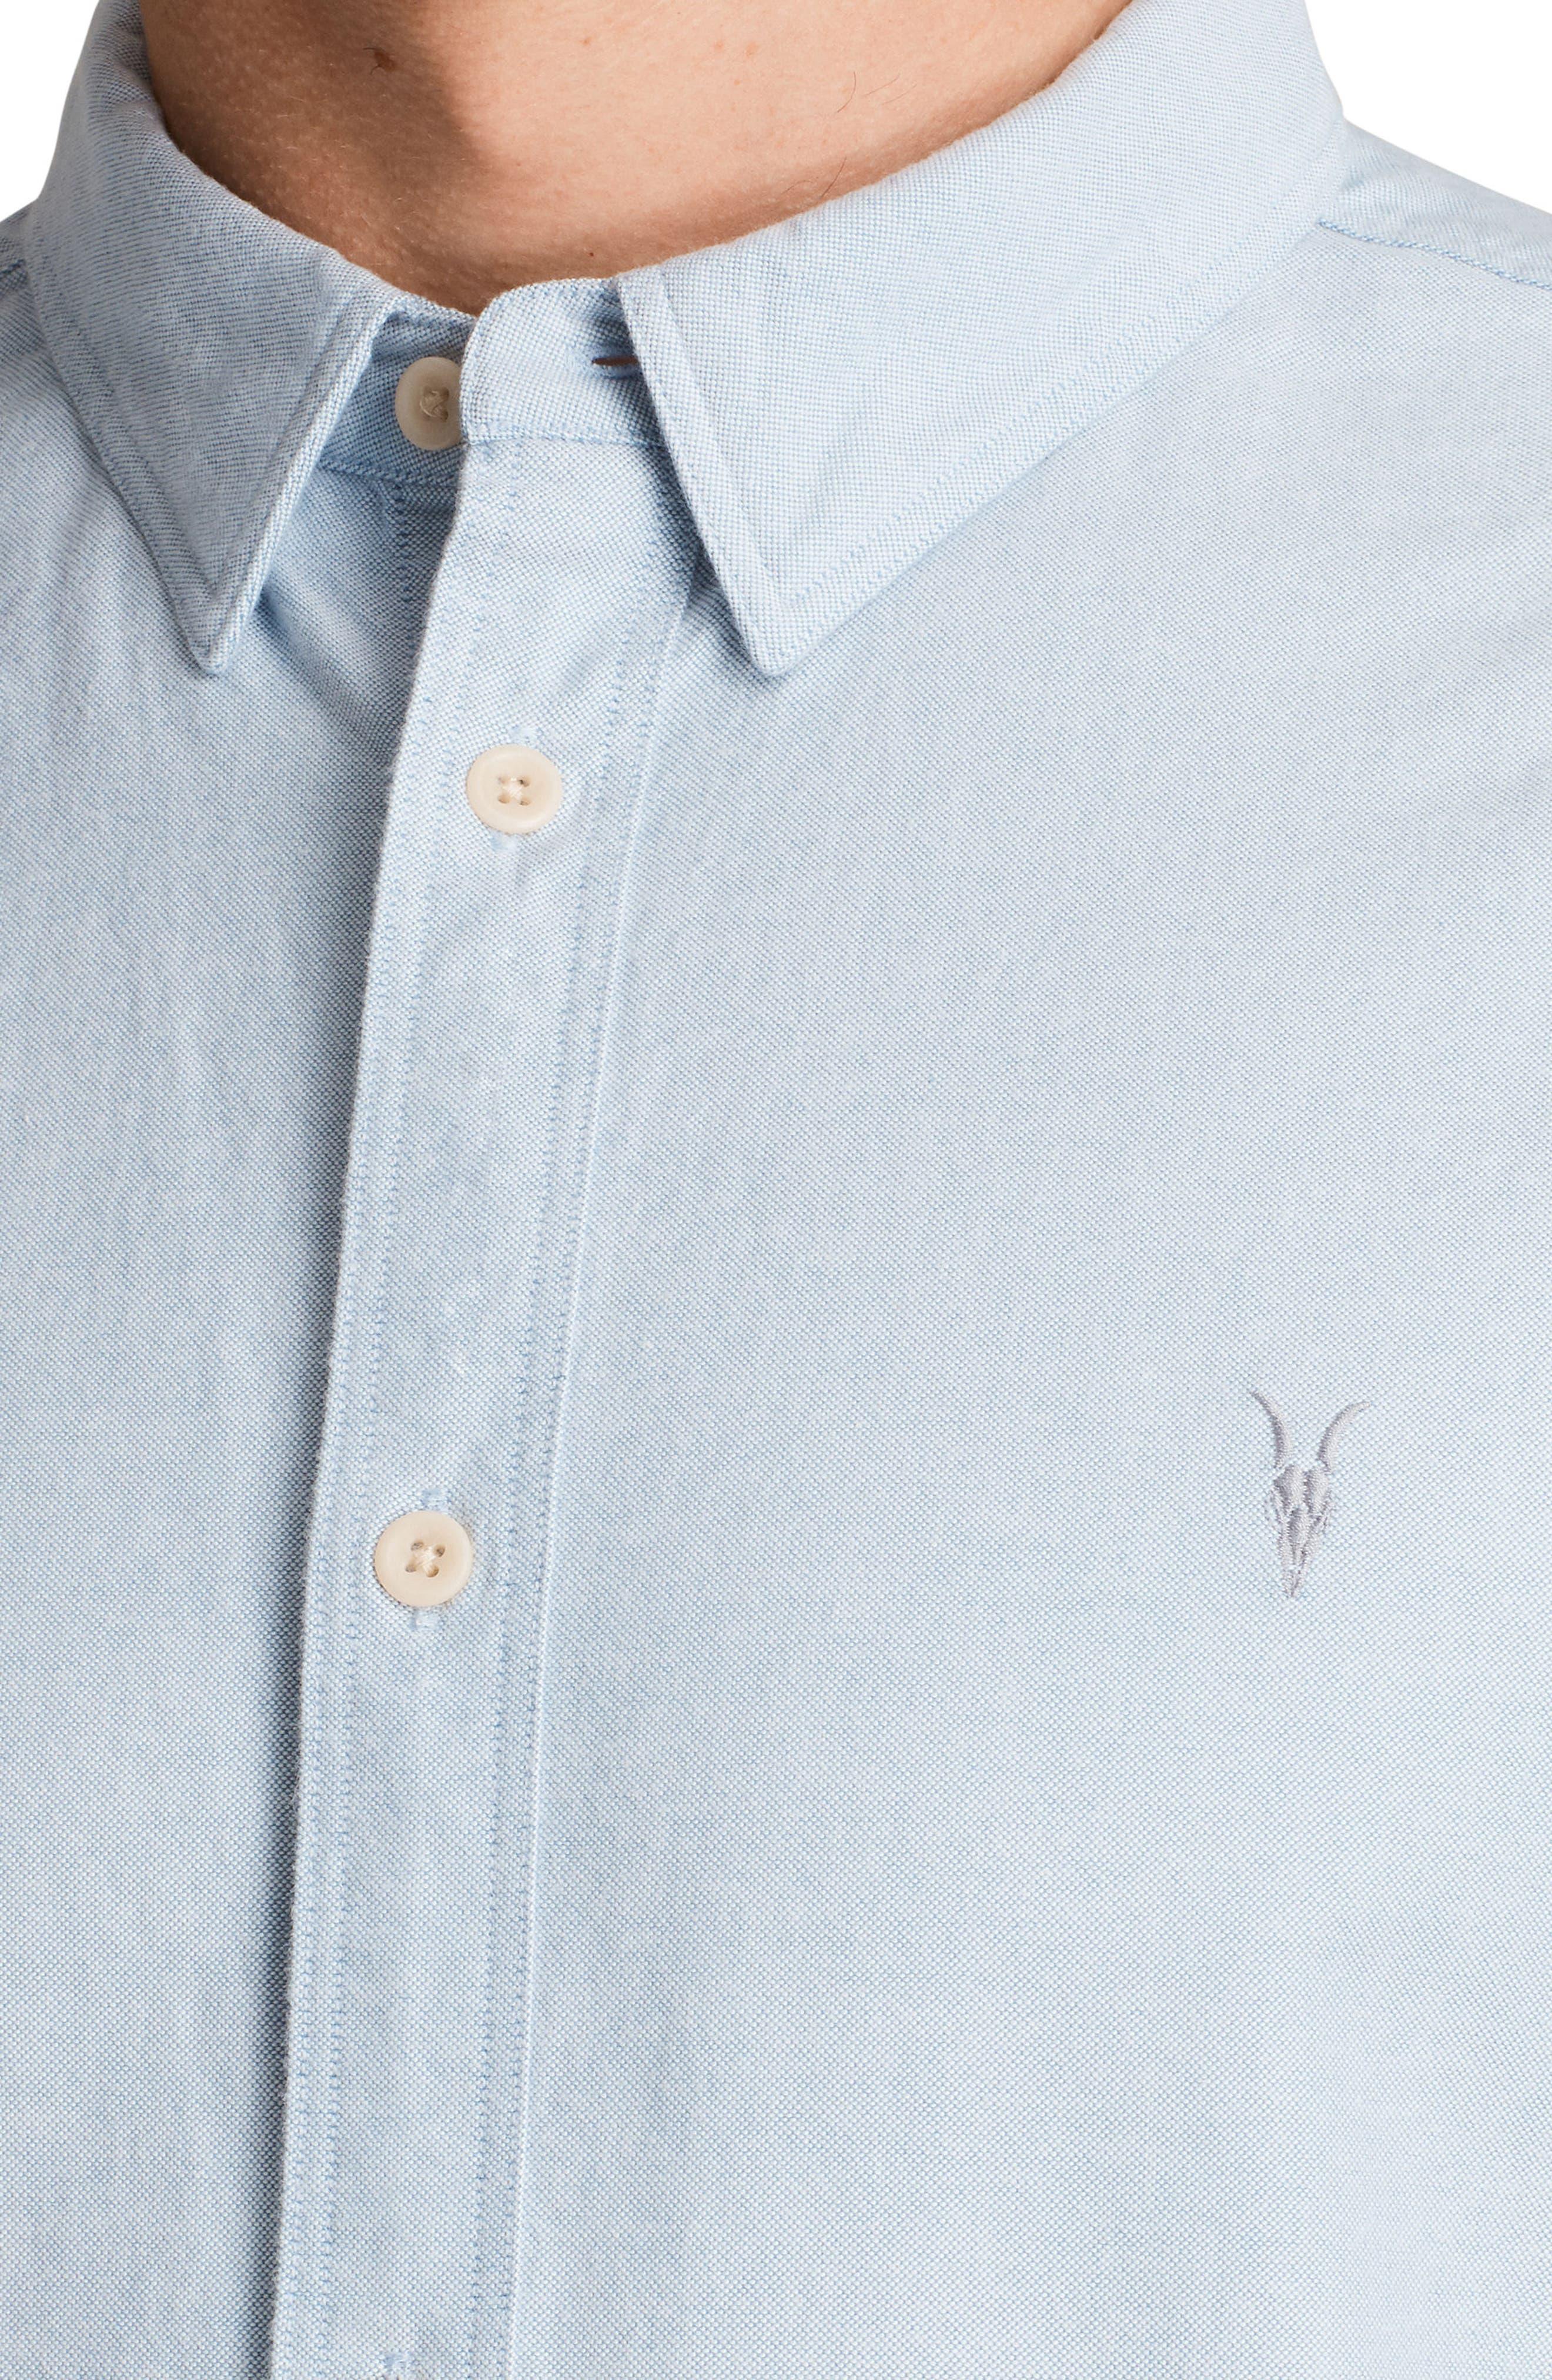 Huntington Regular Fit Short Sleeve Sport Shirt,                             Alternate thumbnail 20, color,